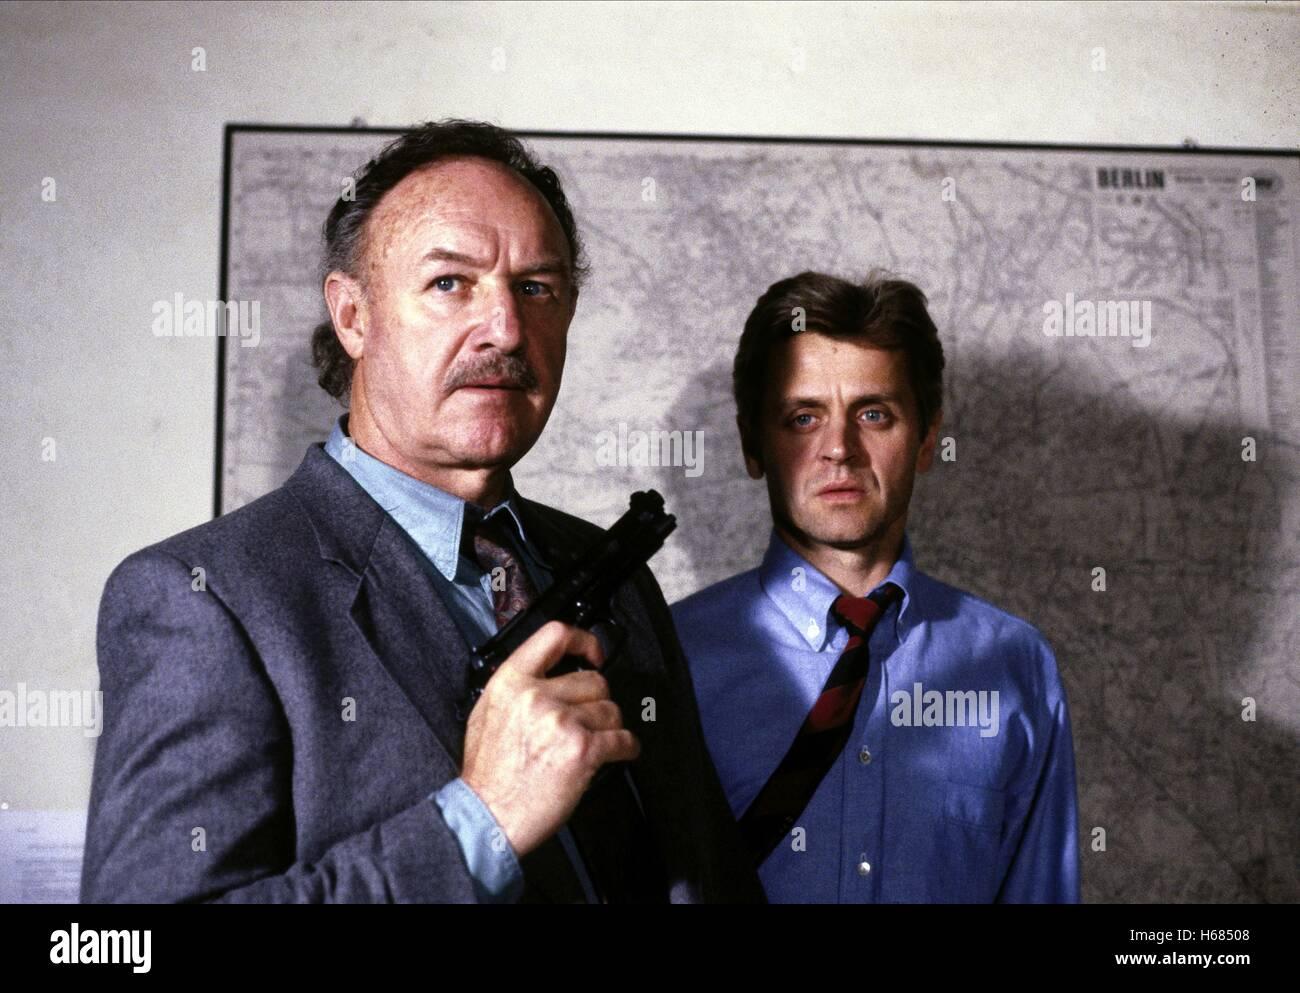 GENE HACKMAN, MIKHAIL BARYSHNIKOV, COMPANY BUSINESS, 1991 - Stock Image